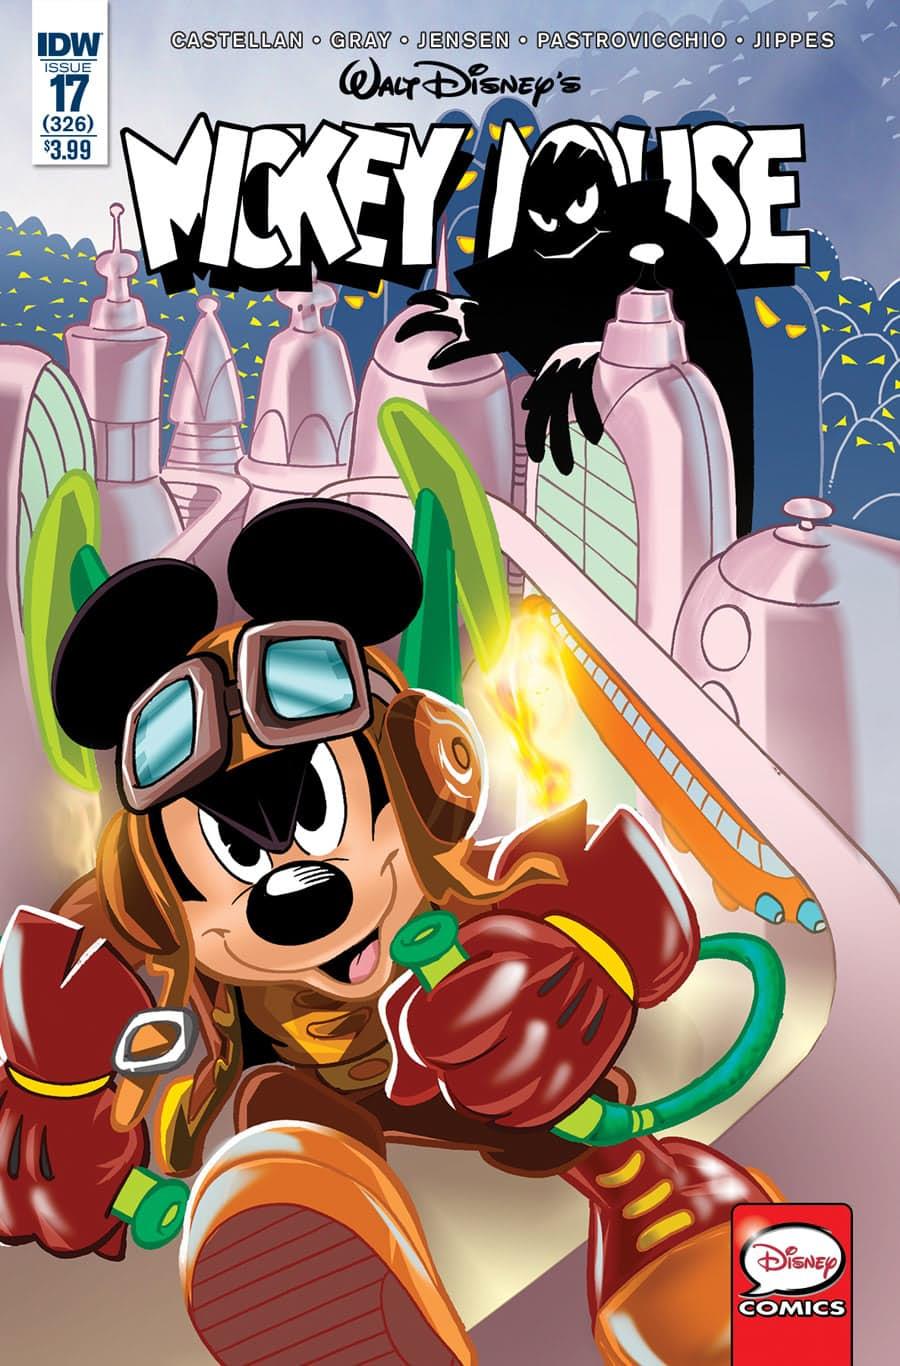 Disney Comics IDW February 2017 Solicitations